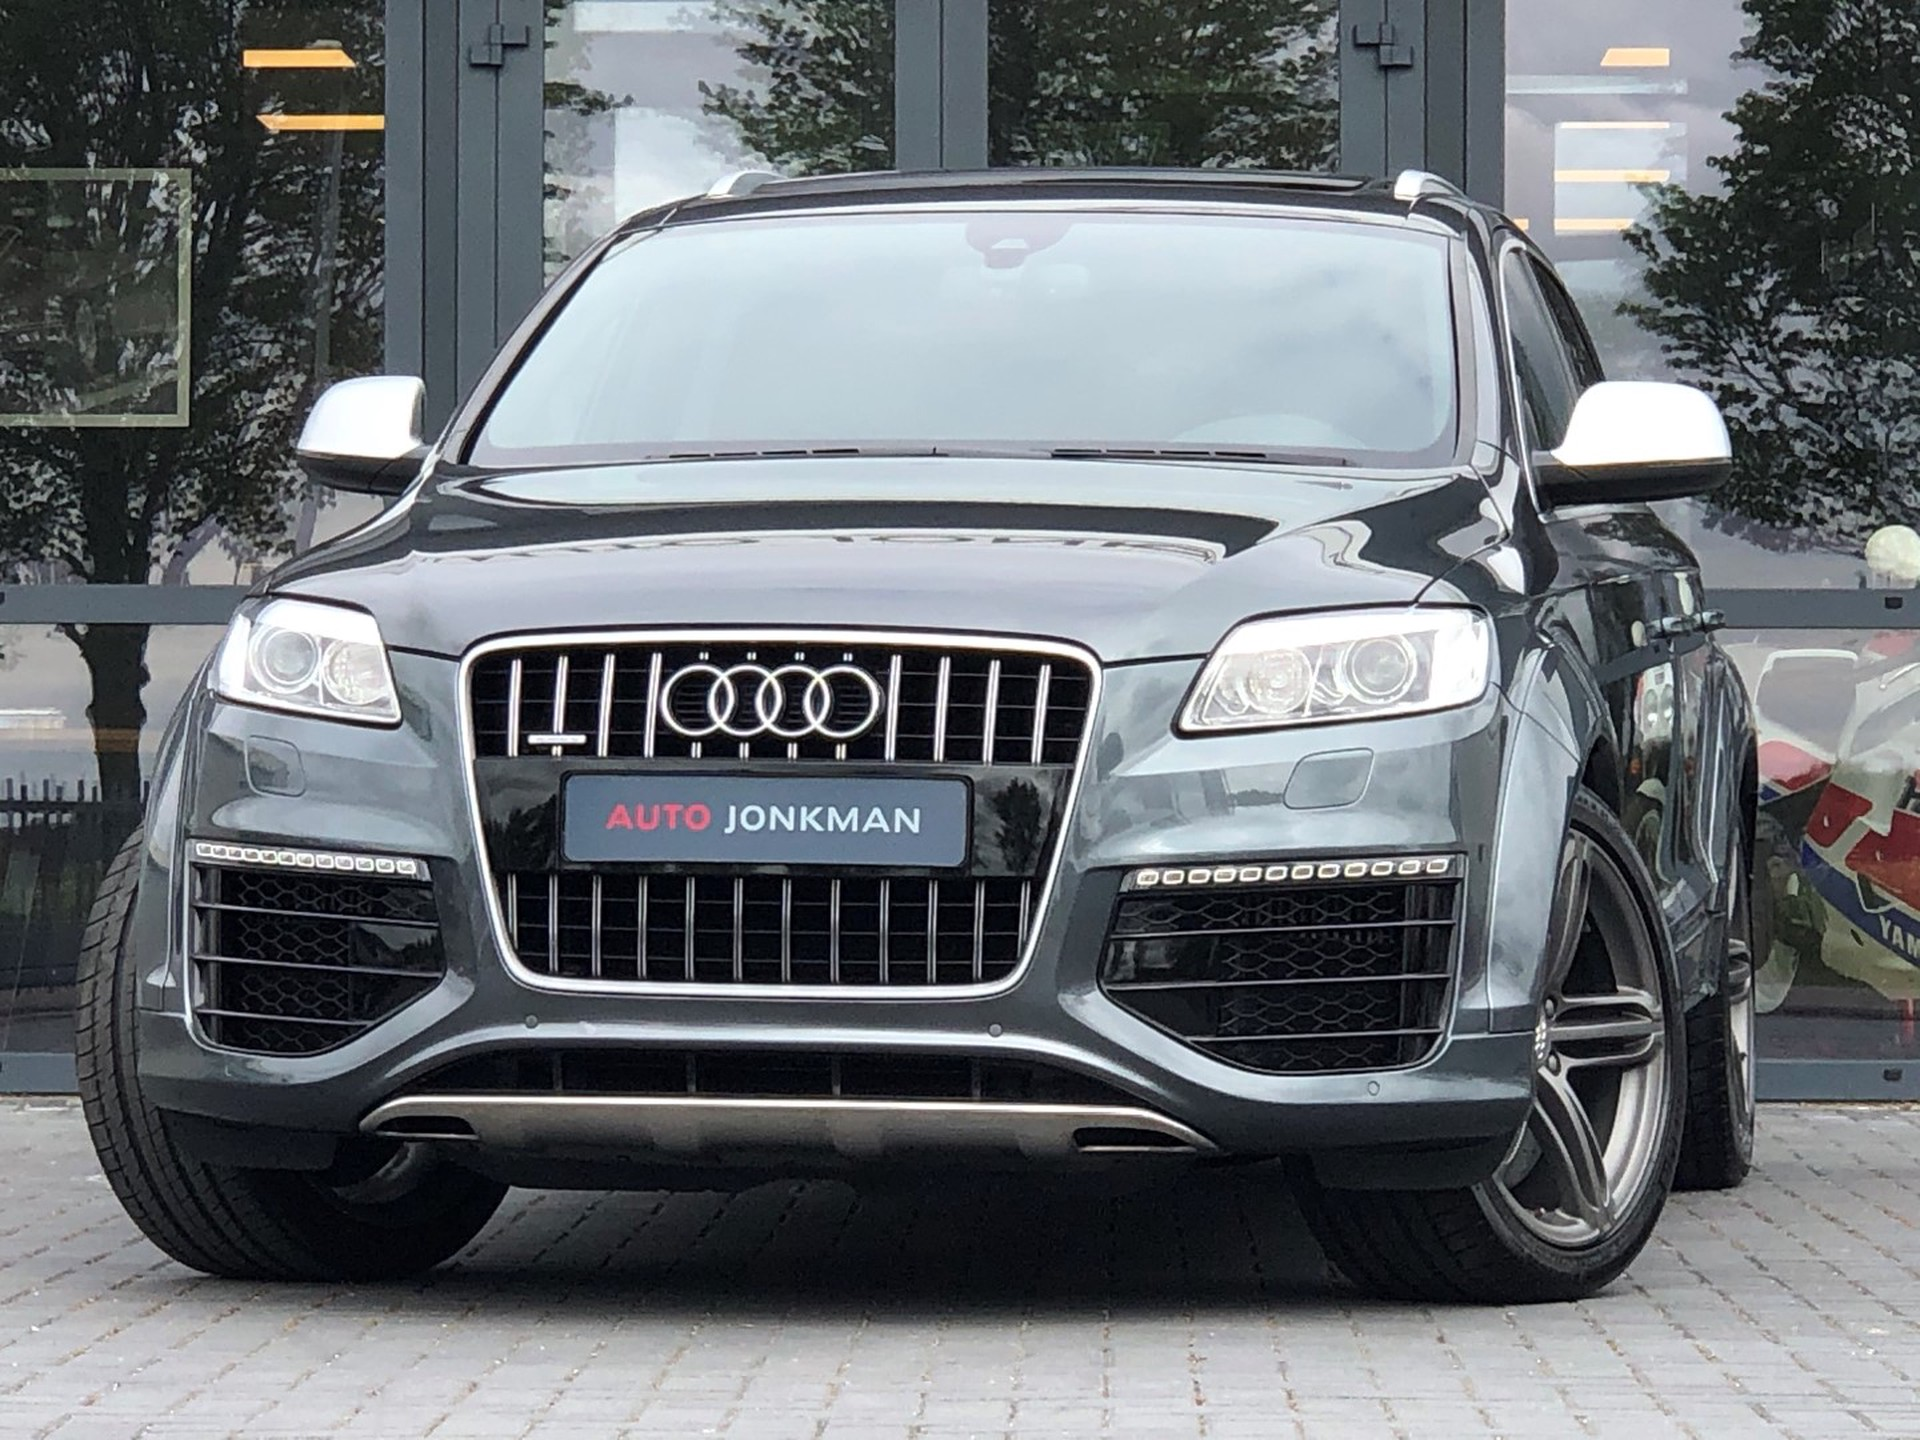 Audi-Q7-6.0 V12 TDI quattro 5+2 Keramische schijven, Dubbel dak, Adaptive cruise control, DVD , etc.-Auto Jonkman